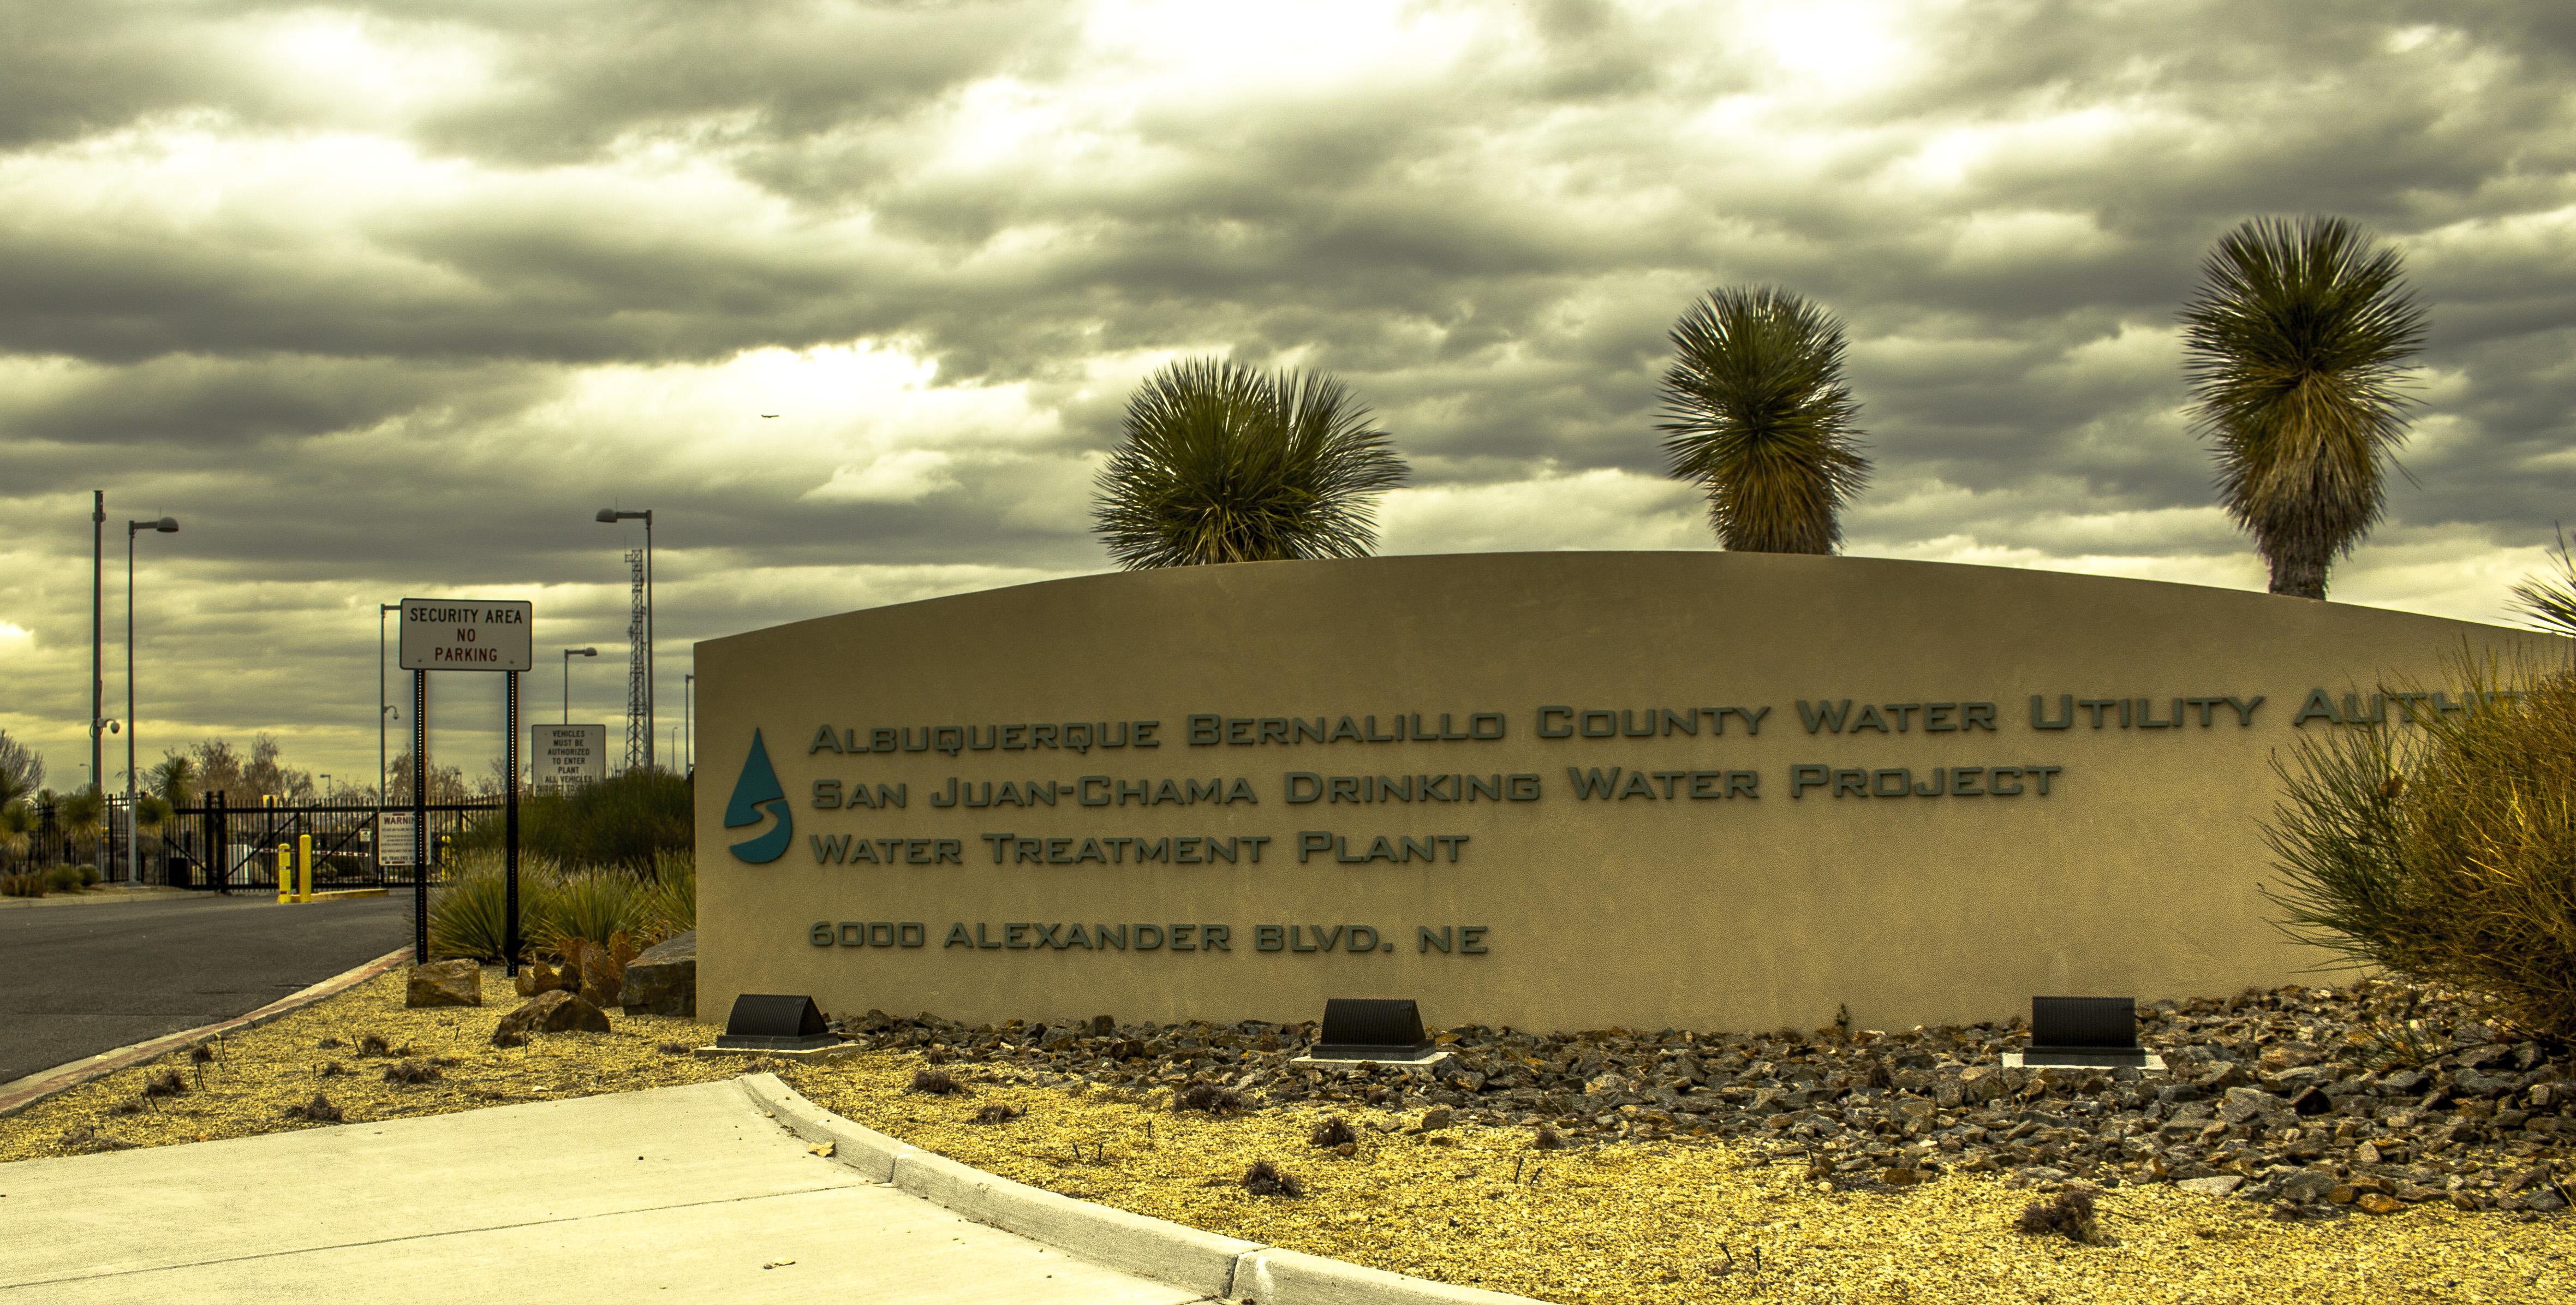 Water Authority Albuquerque 52